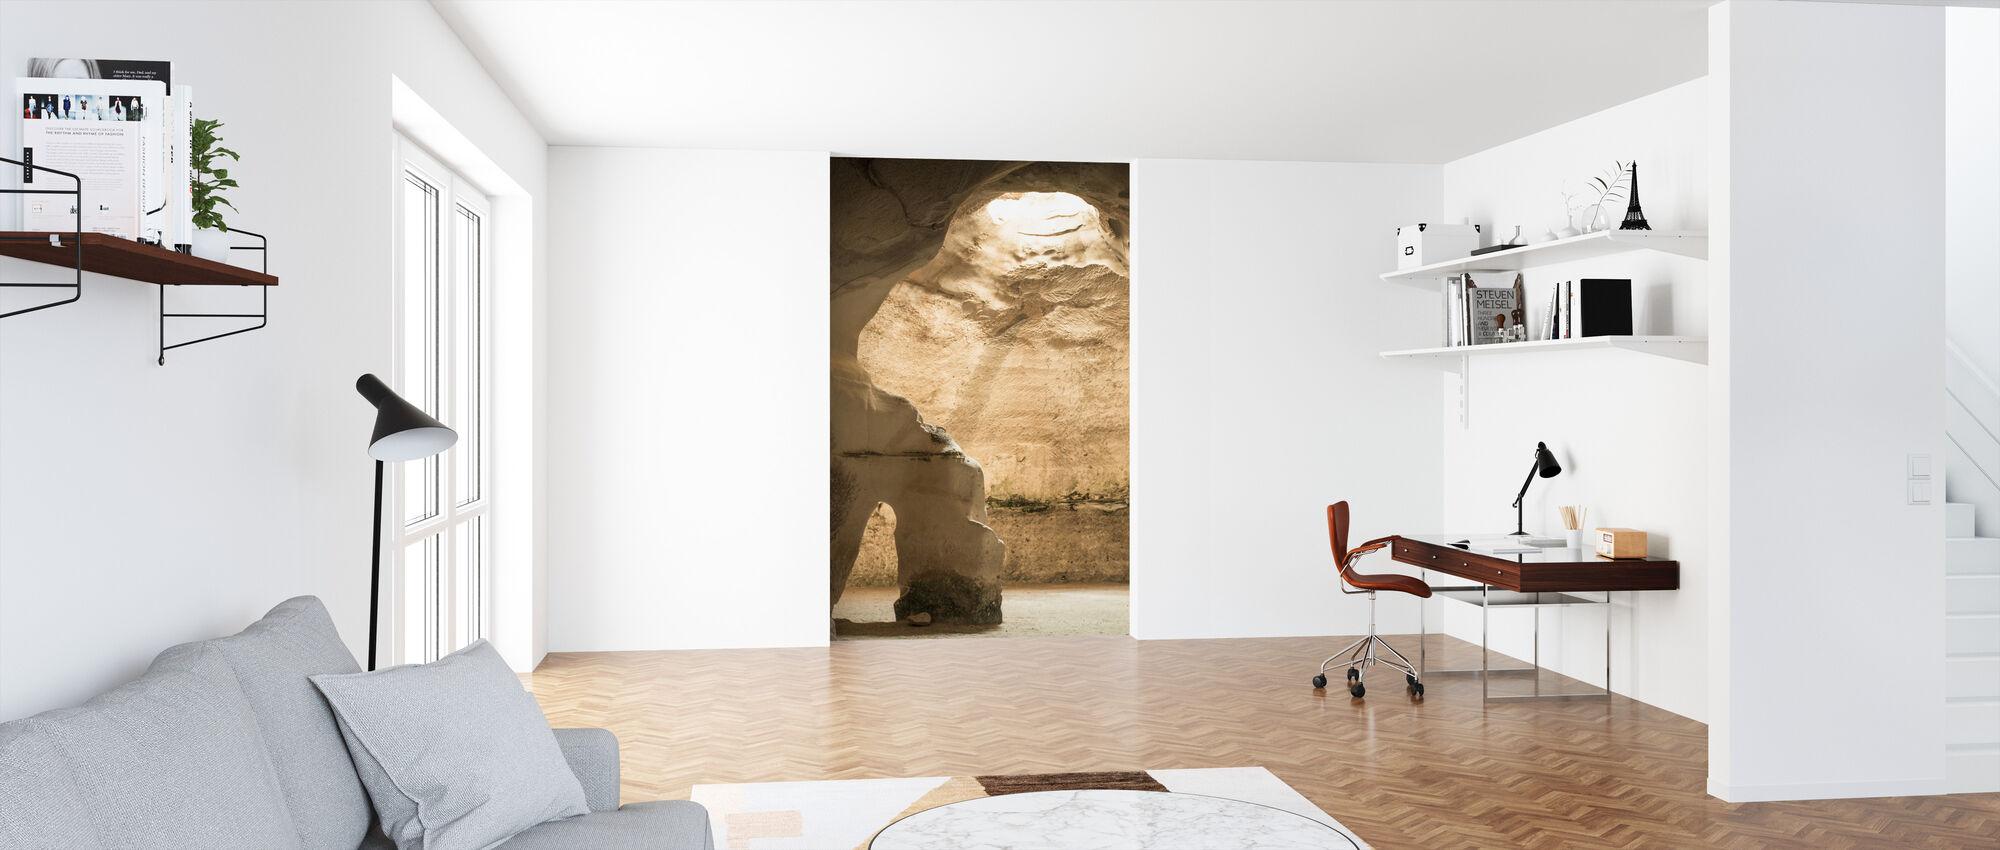 Cave Light - Wallpaper - Office